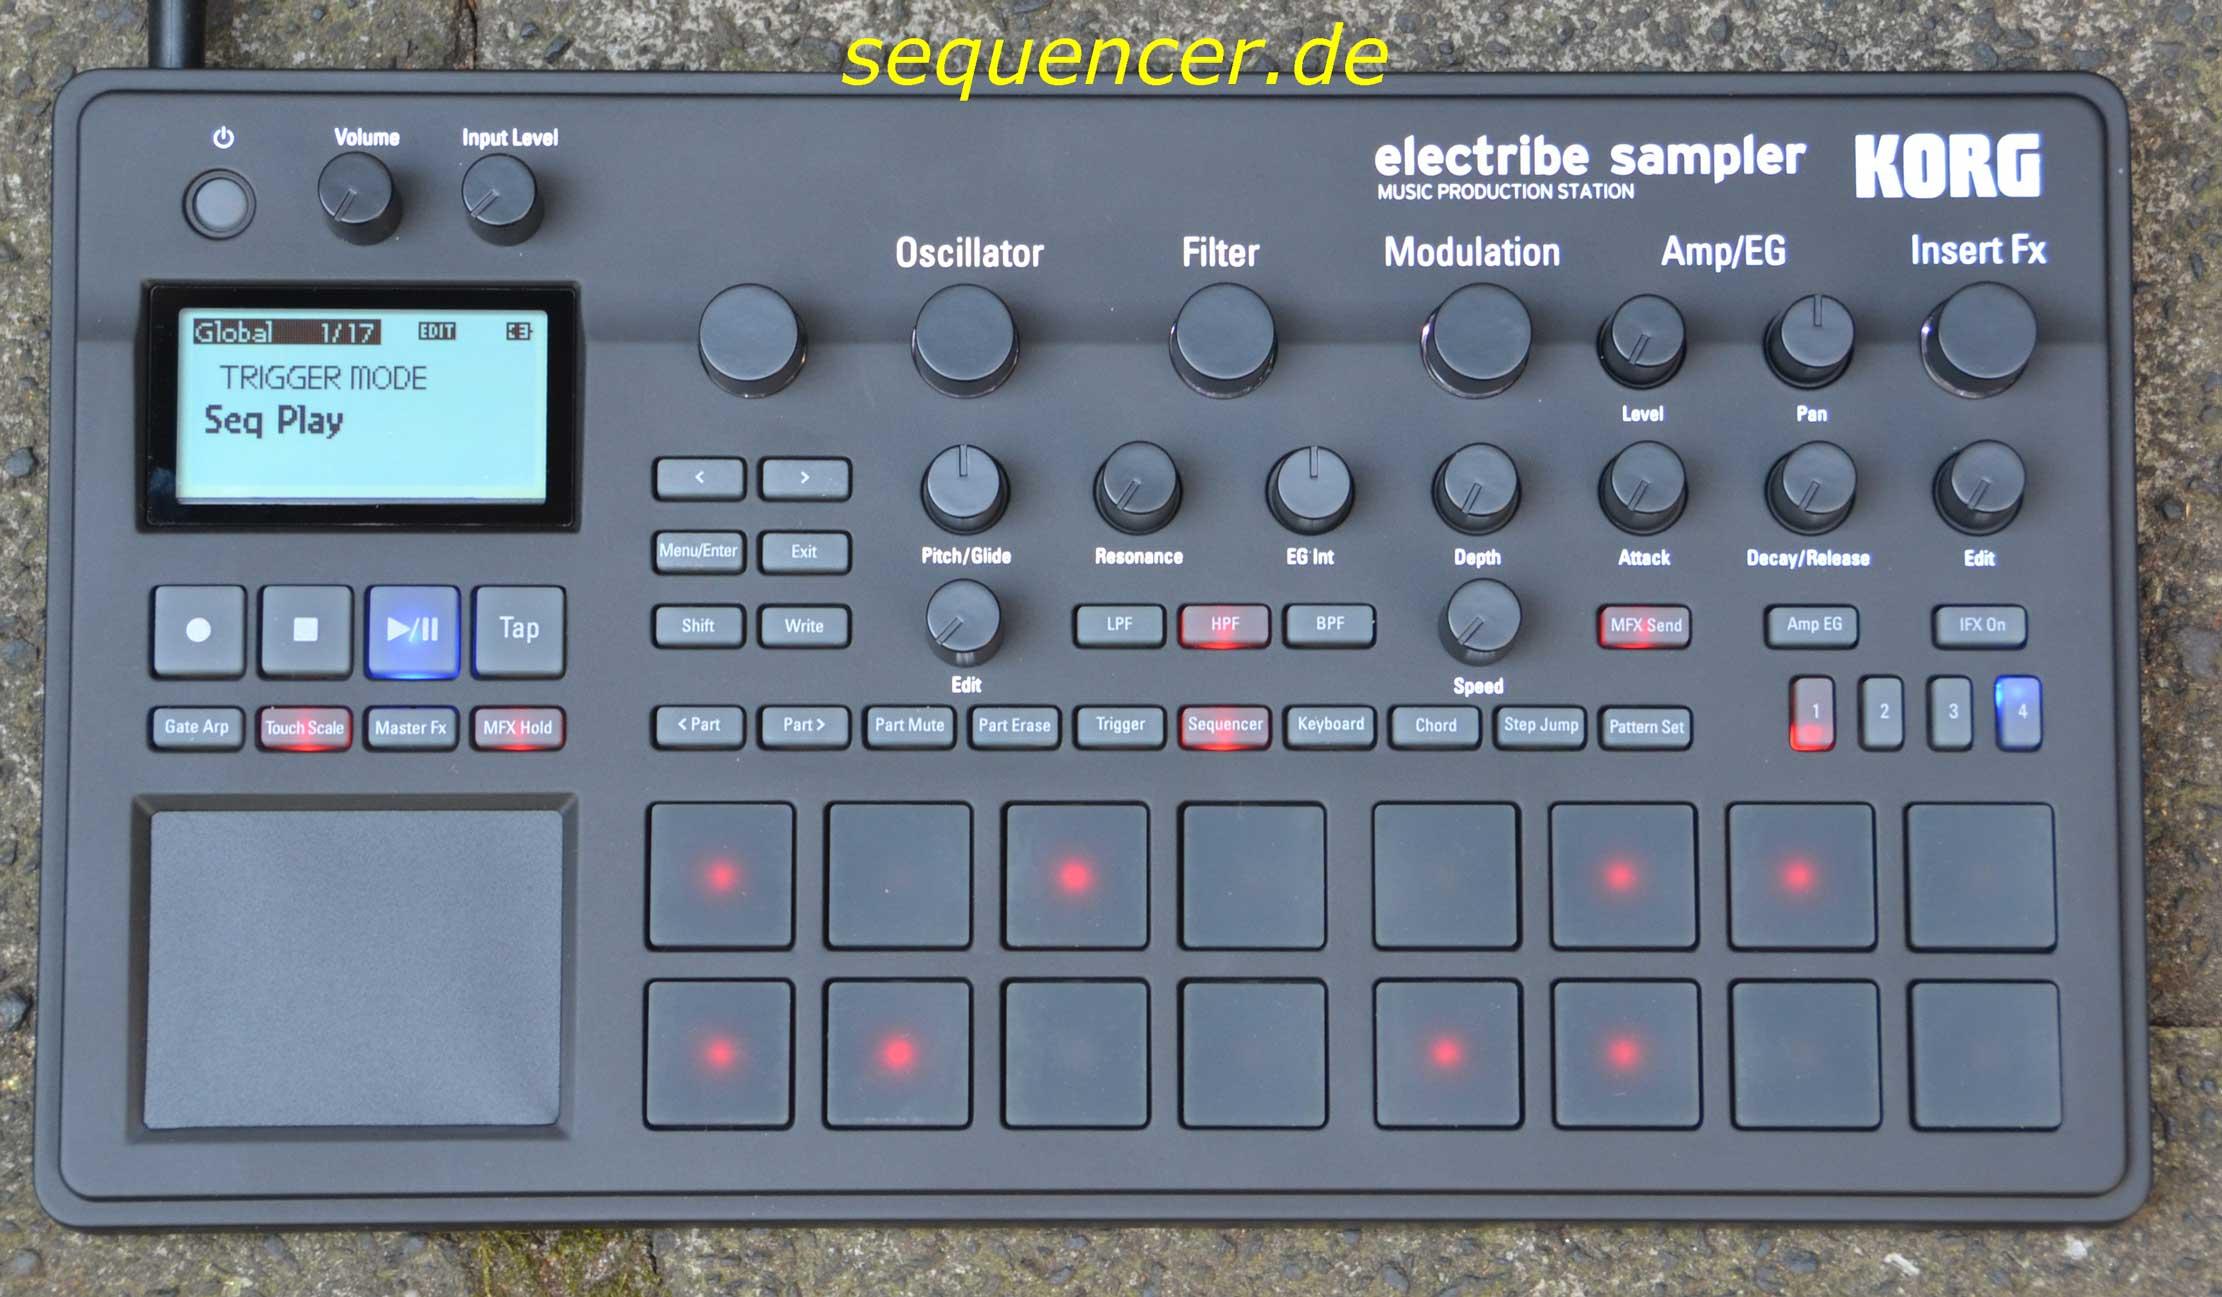 Korg Electribe Sampler S2 synthesizer